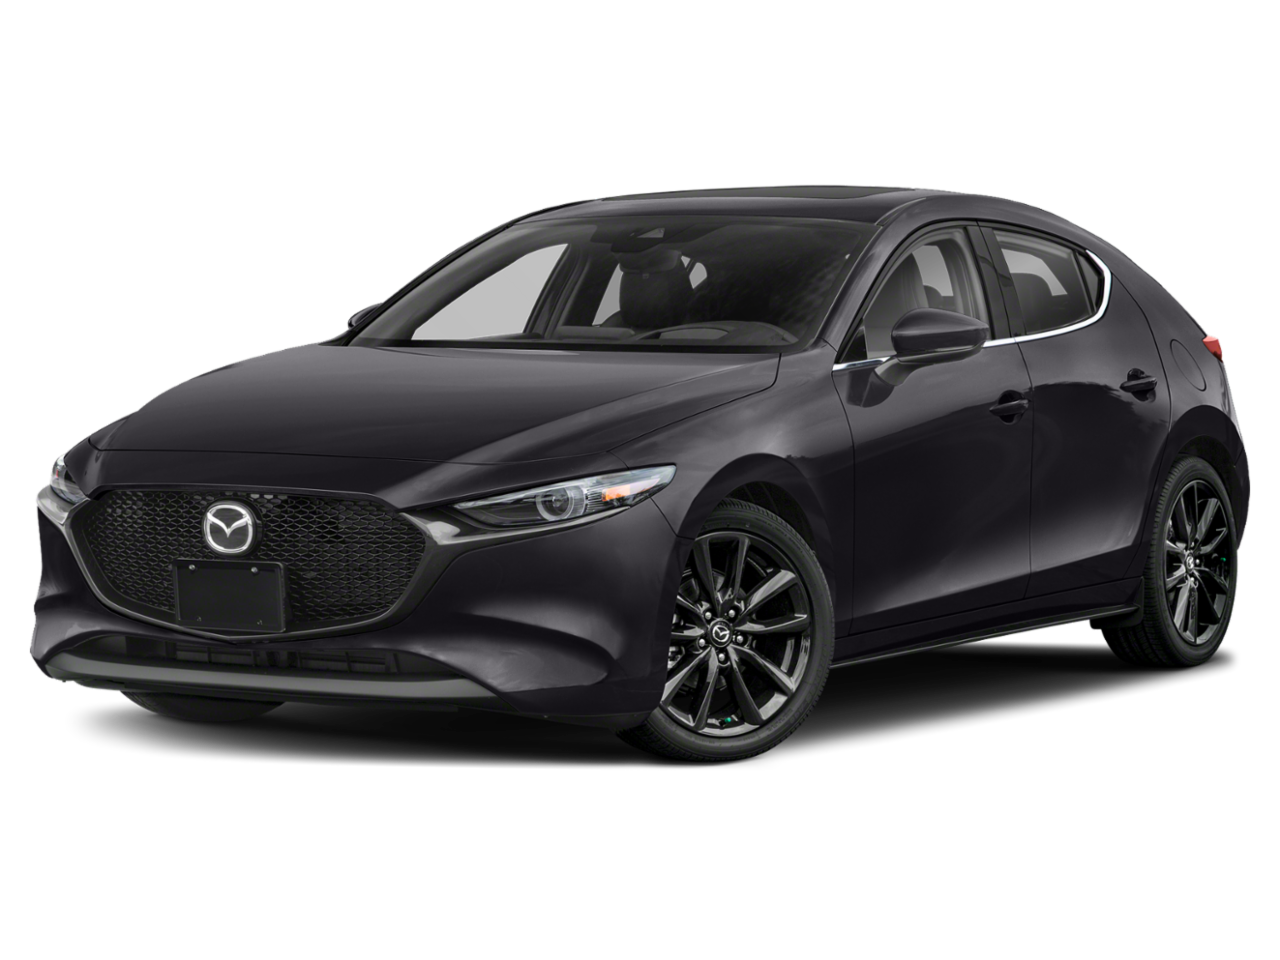 Mazda 2020 Mazda3 Hatchback Premium Package